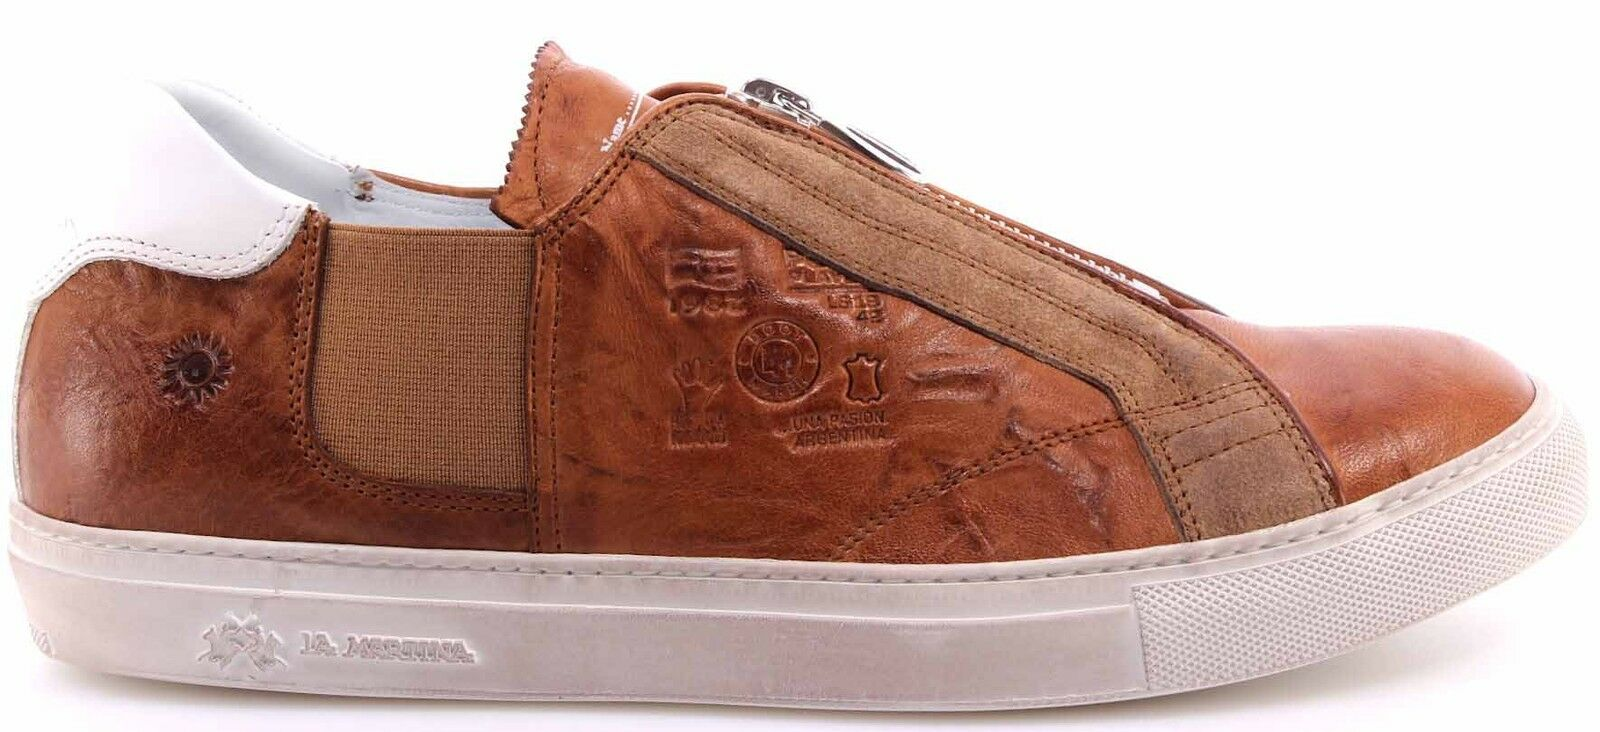 Hommes Baskets chaussures La Martina l3000121 Plutone Cuoio Cuero Cuir Made